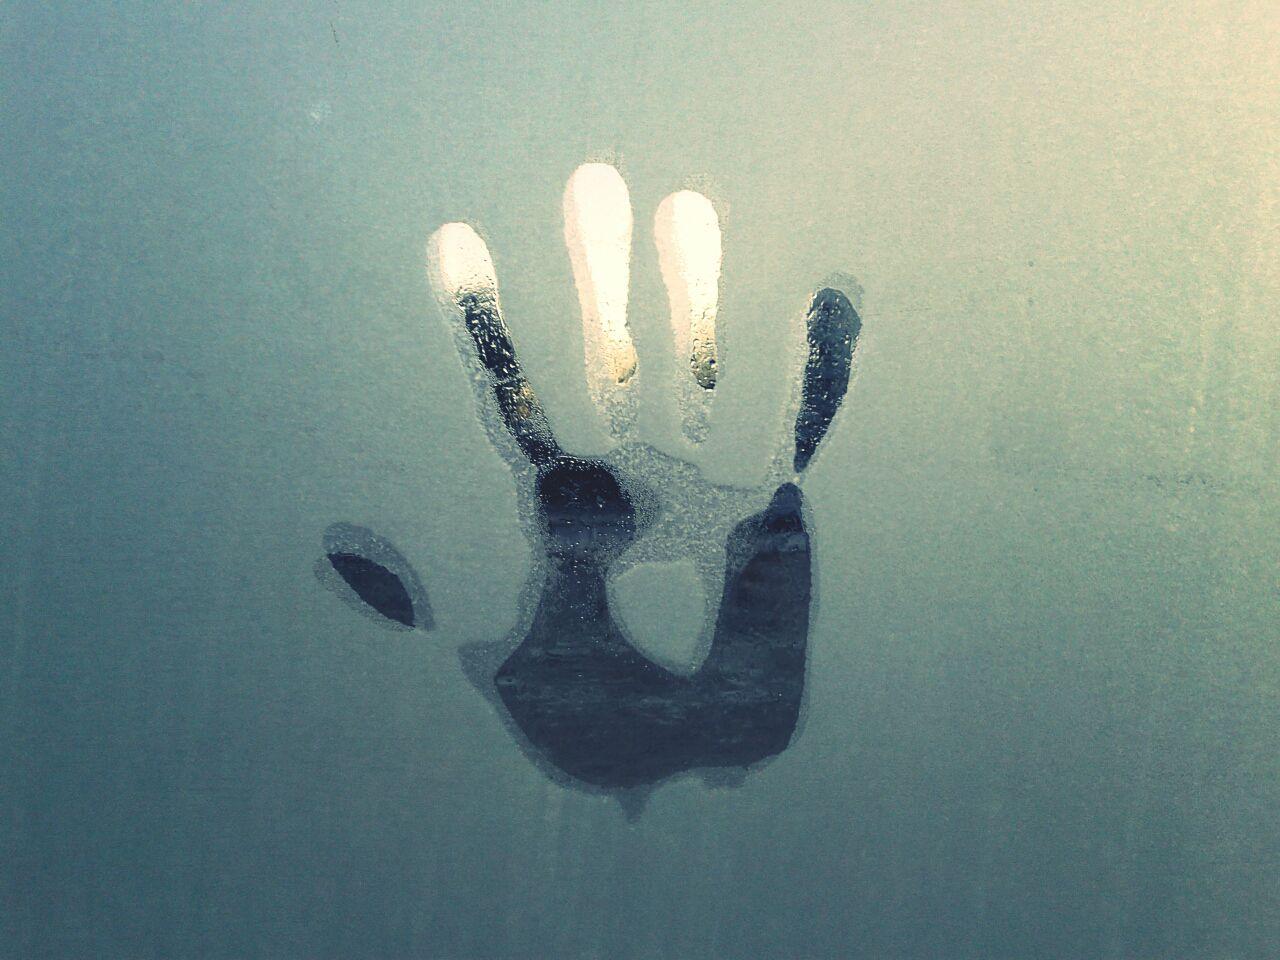 handprint on foggy window